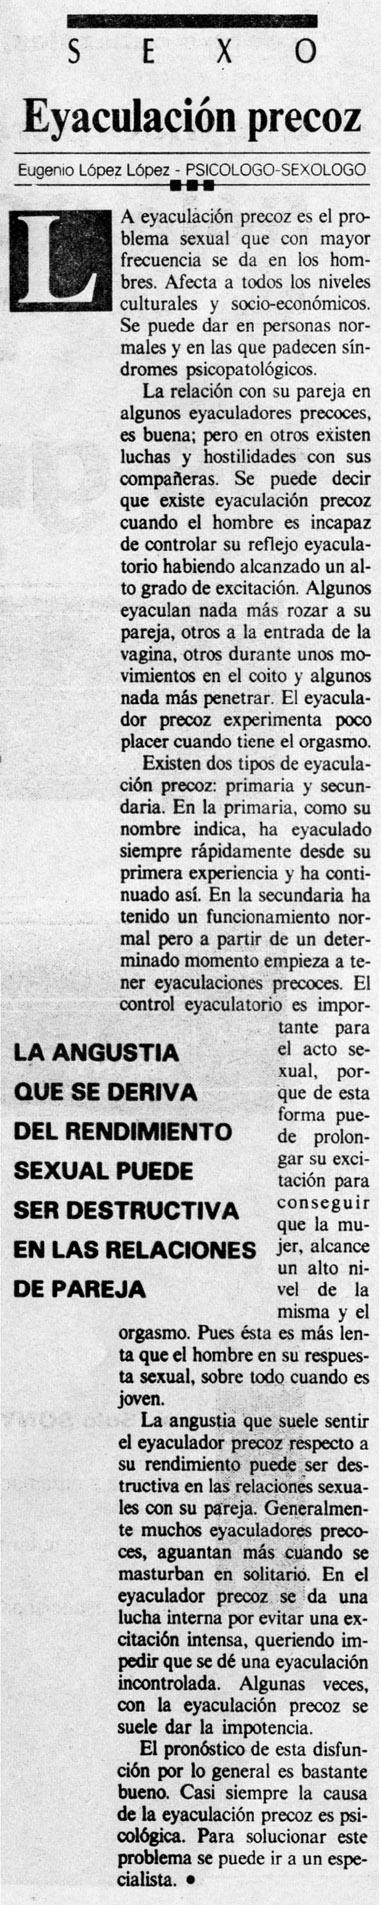 1991-04-21-p-1